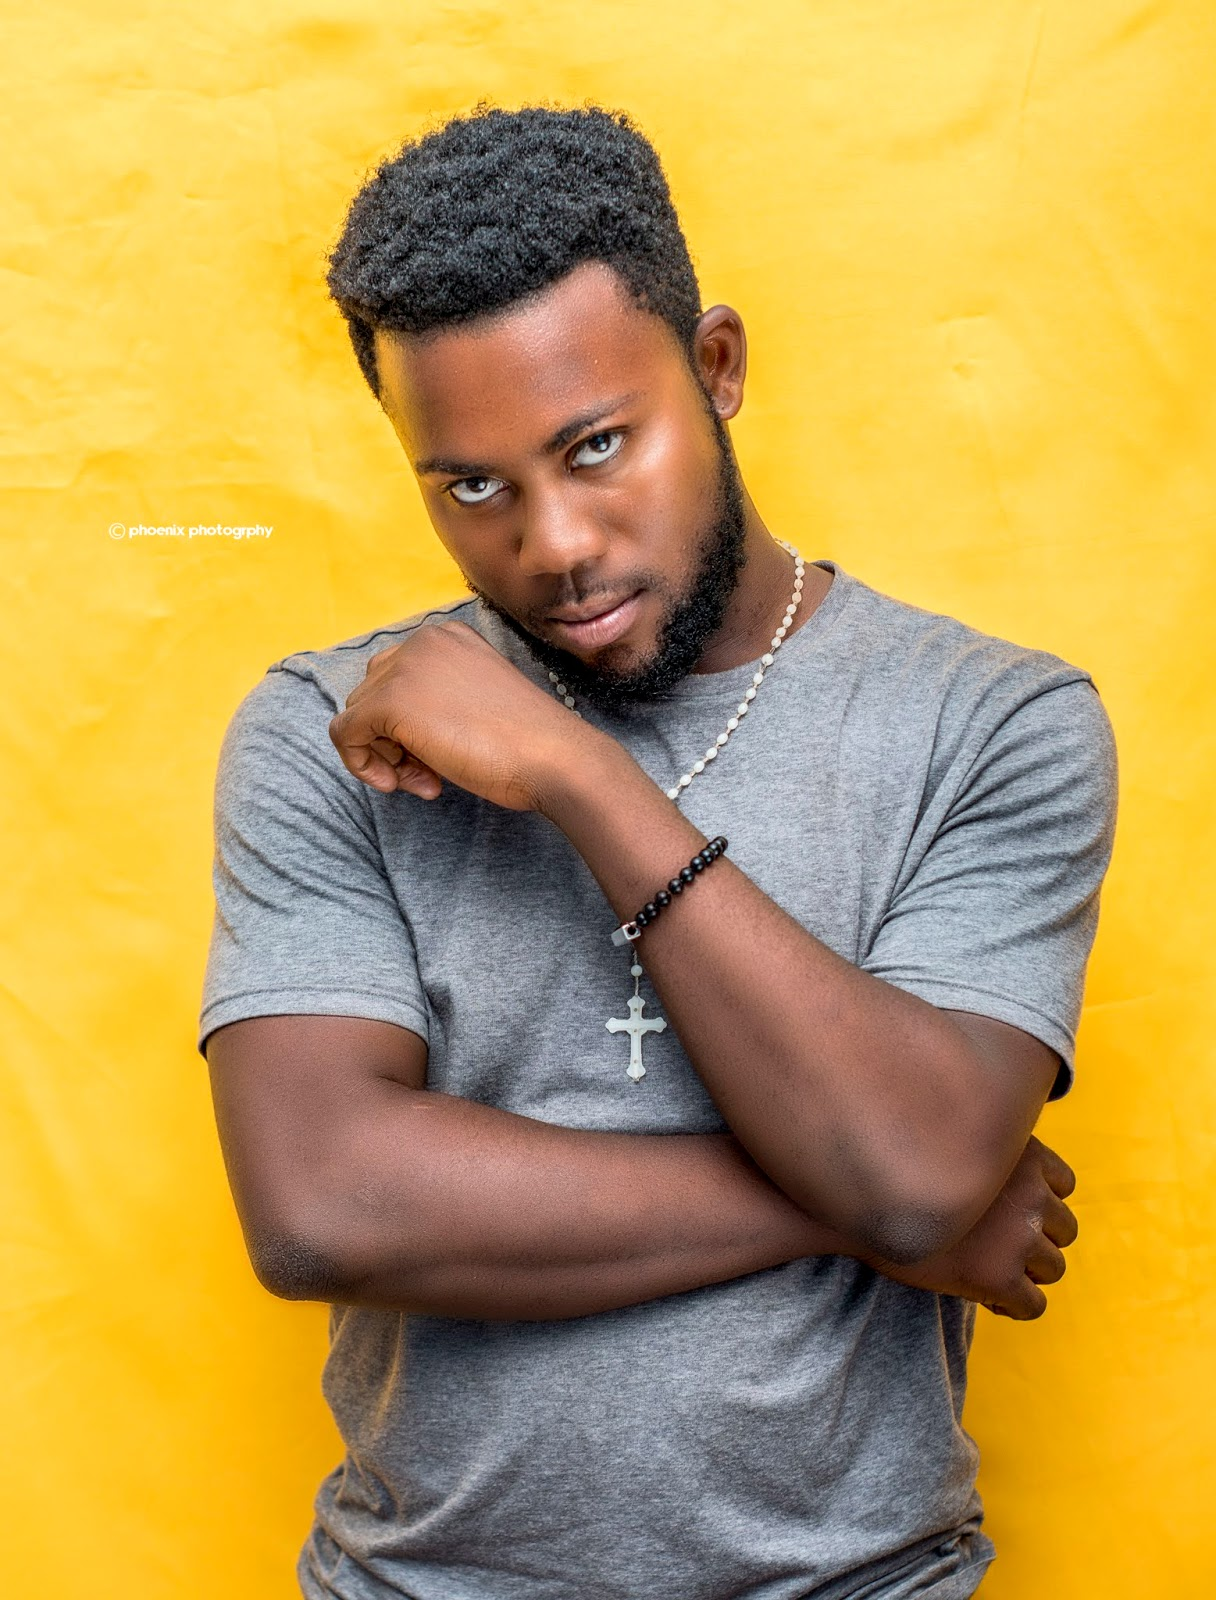 Tony Blazr Lord of Lyrics Hip Hop/Rap Artist is set to drop EP in November 2019